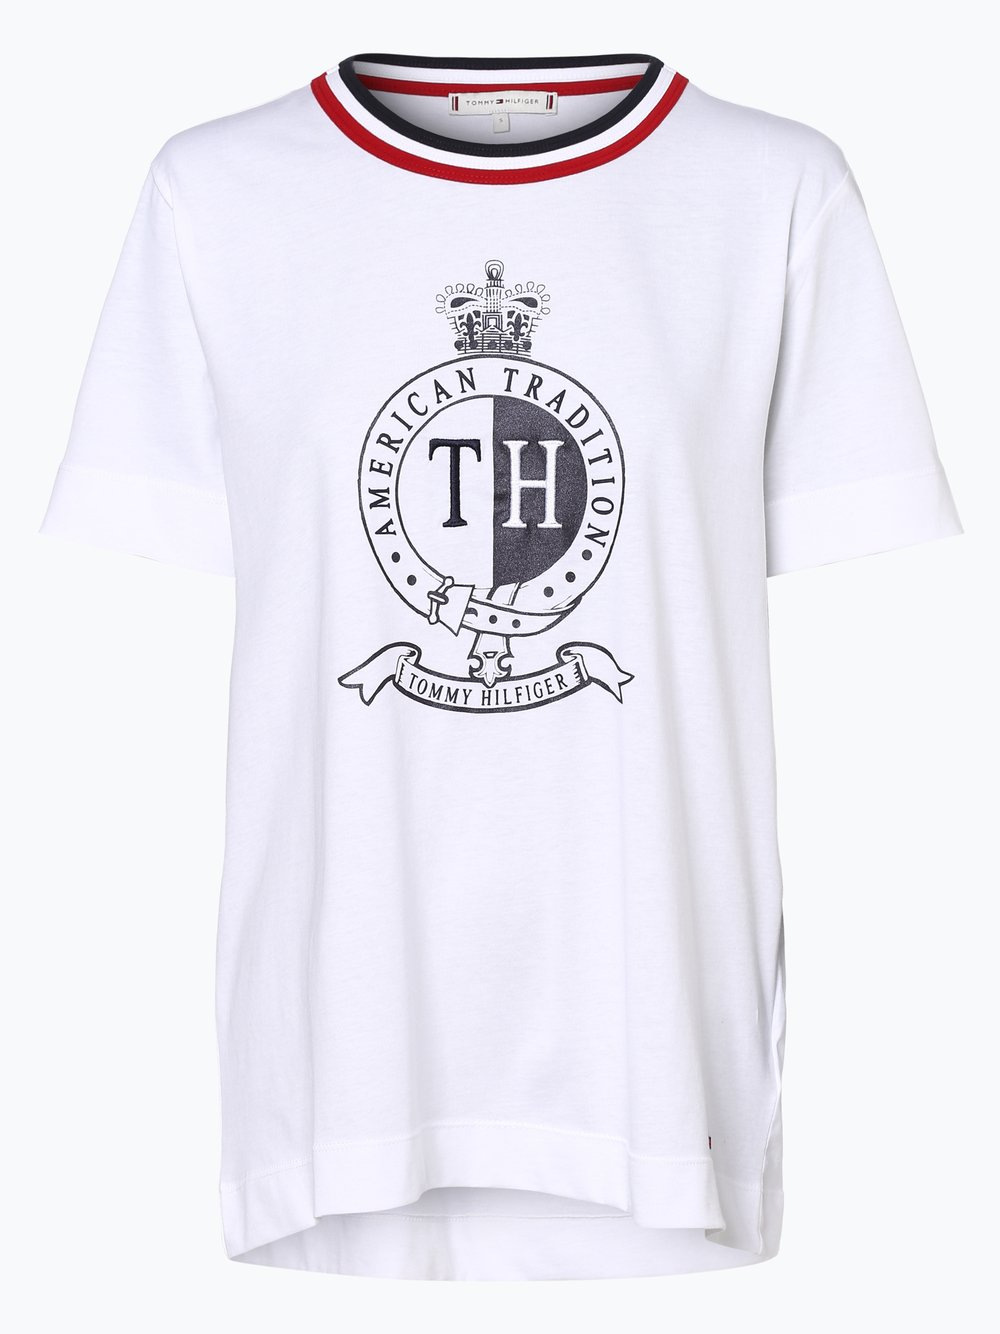 9e5d6a0b7 Tommy Hilfiger T-shirt damski kup online | VANGRAAF.COM